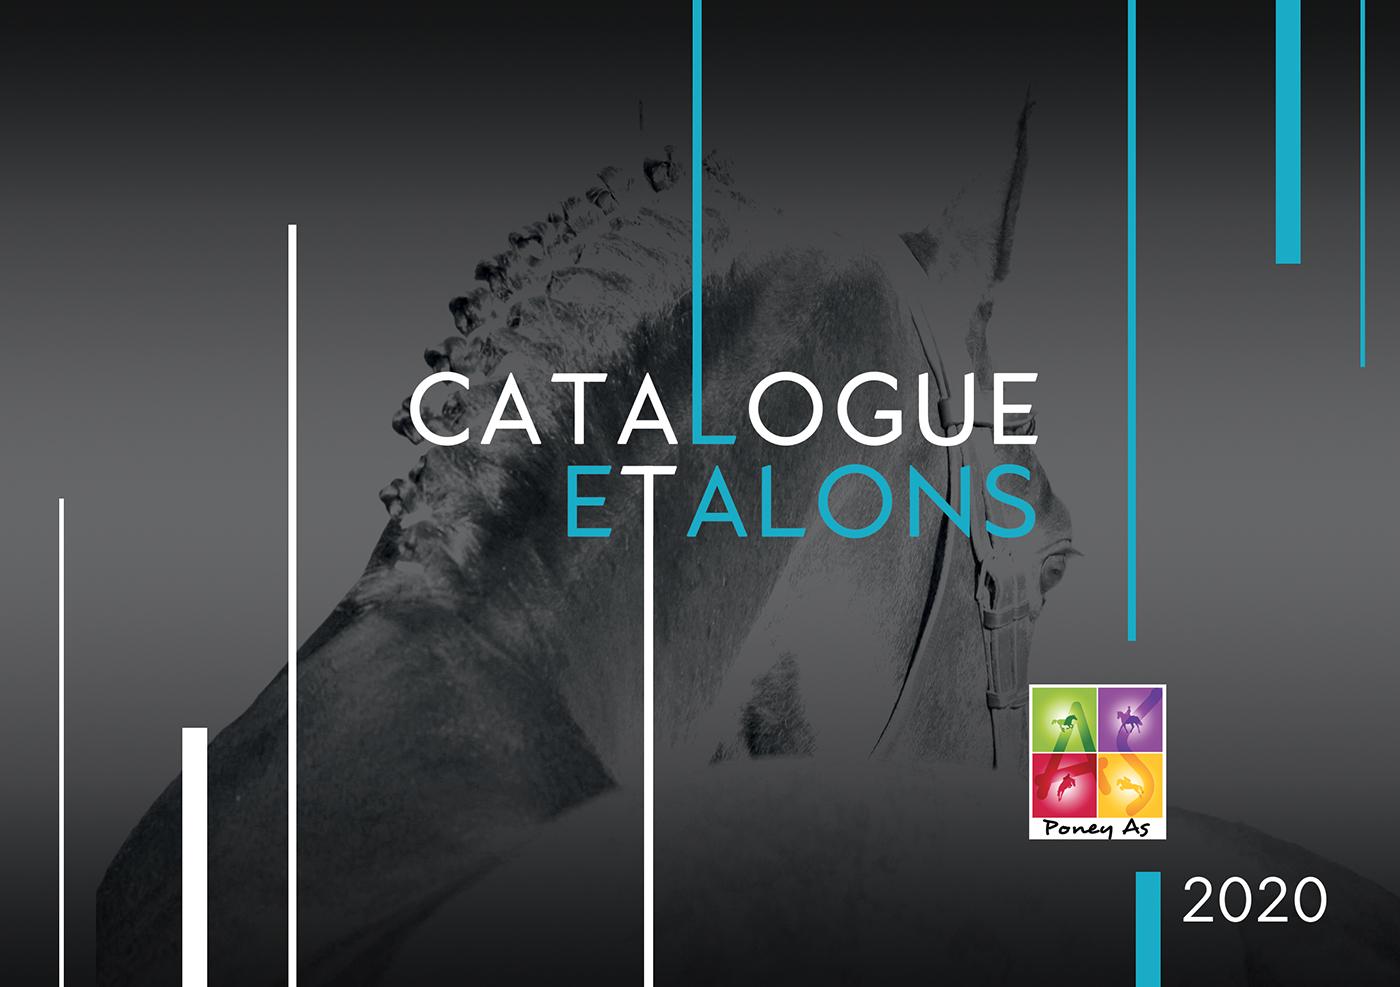 Couv Catalogue Etalons 2020